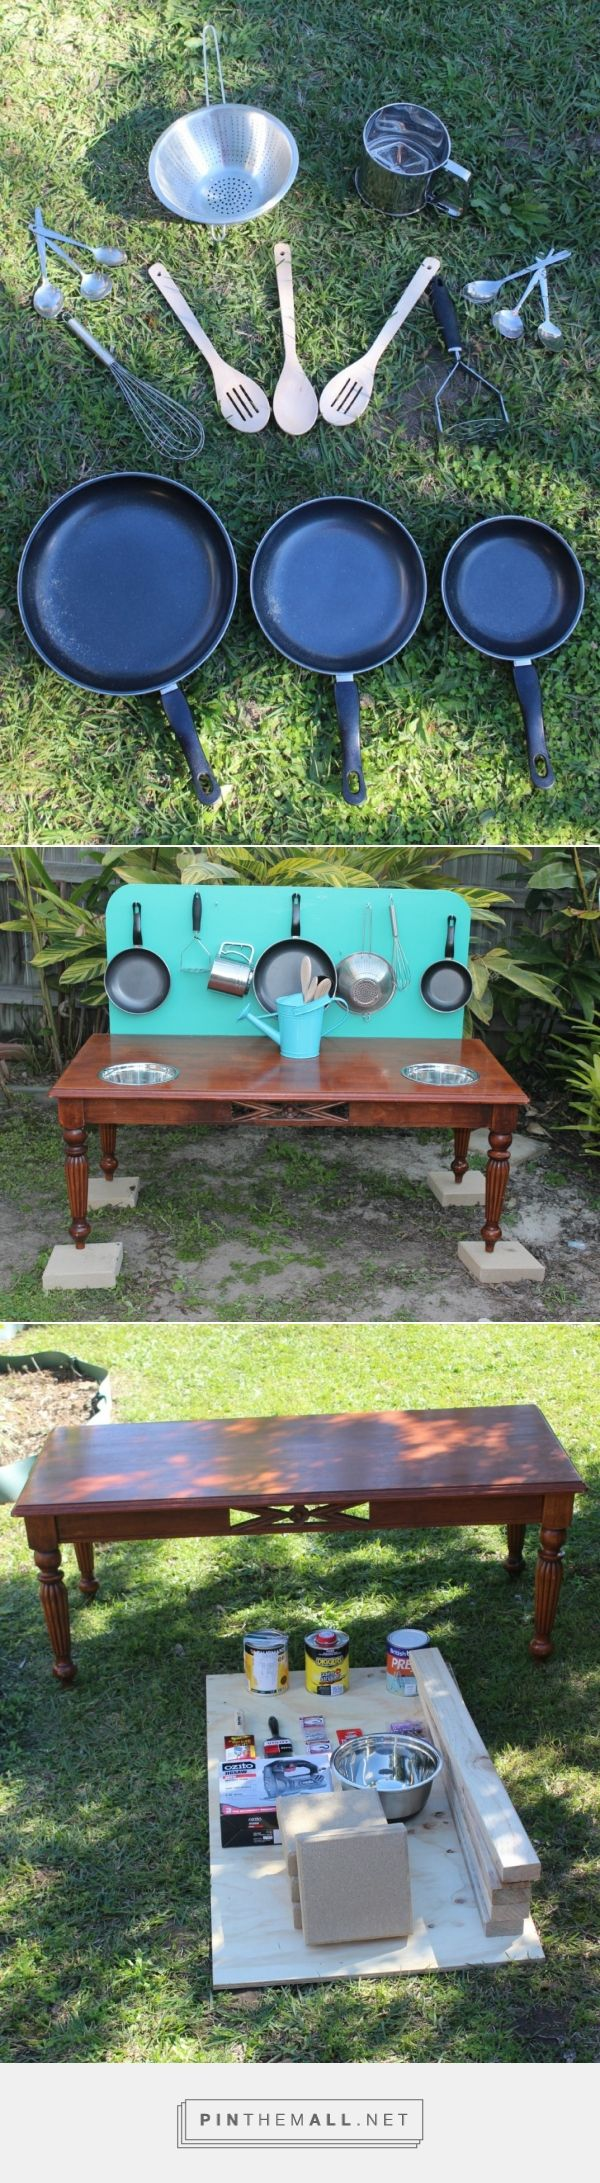 Mud kitchen upcycled pallet mud kitchen pallet kitchen counter with - Making A Mud Kitchen For Kids